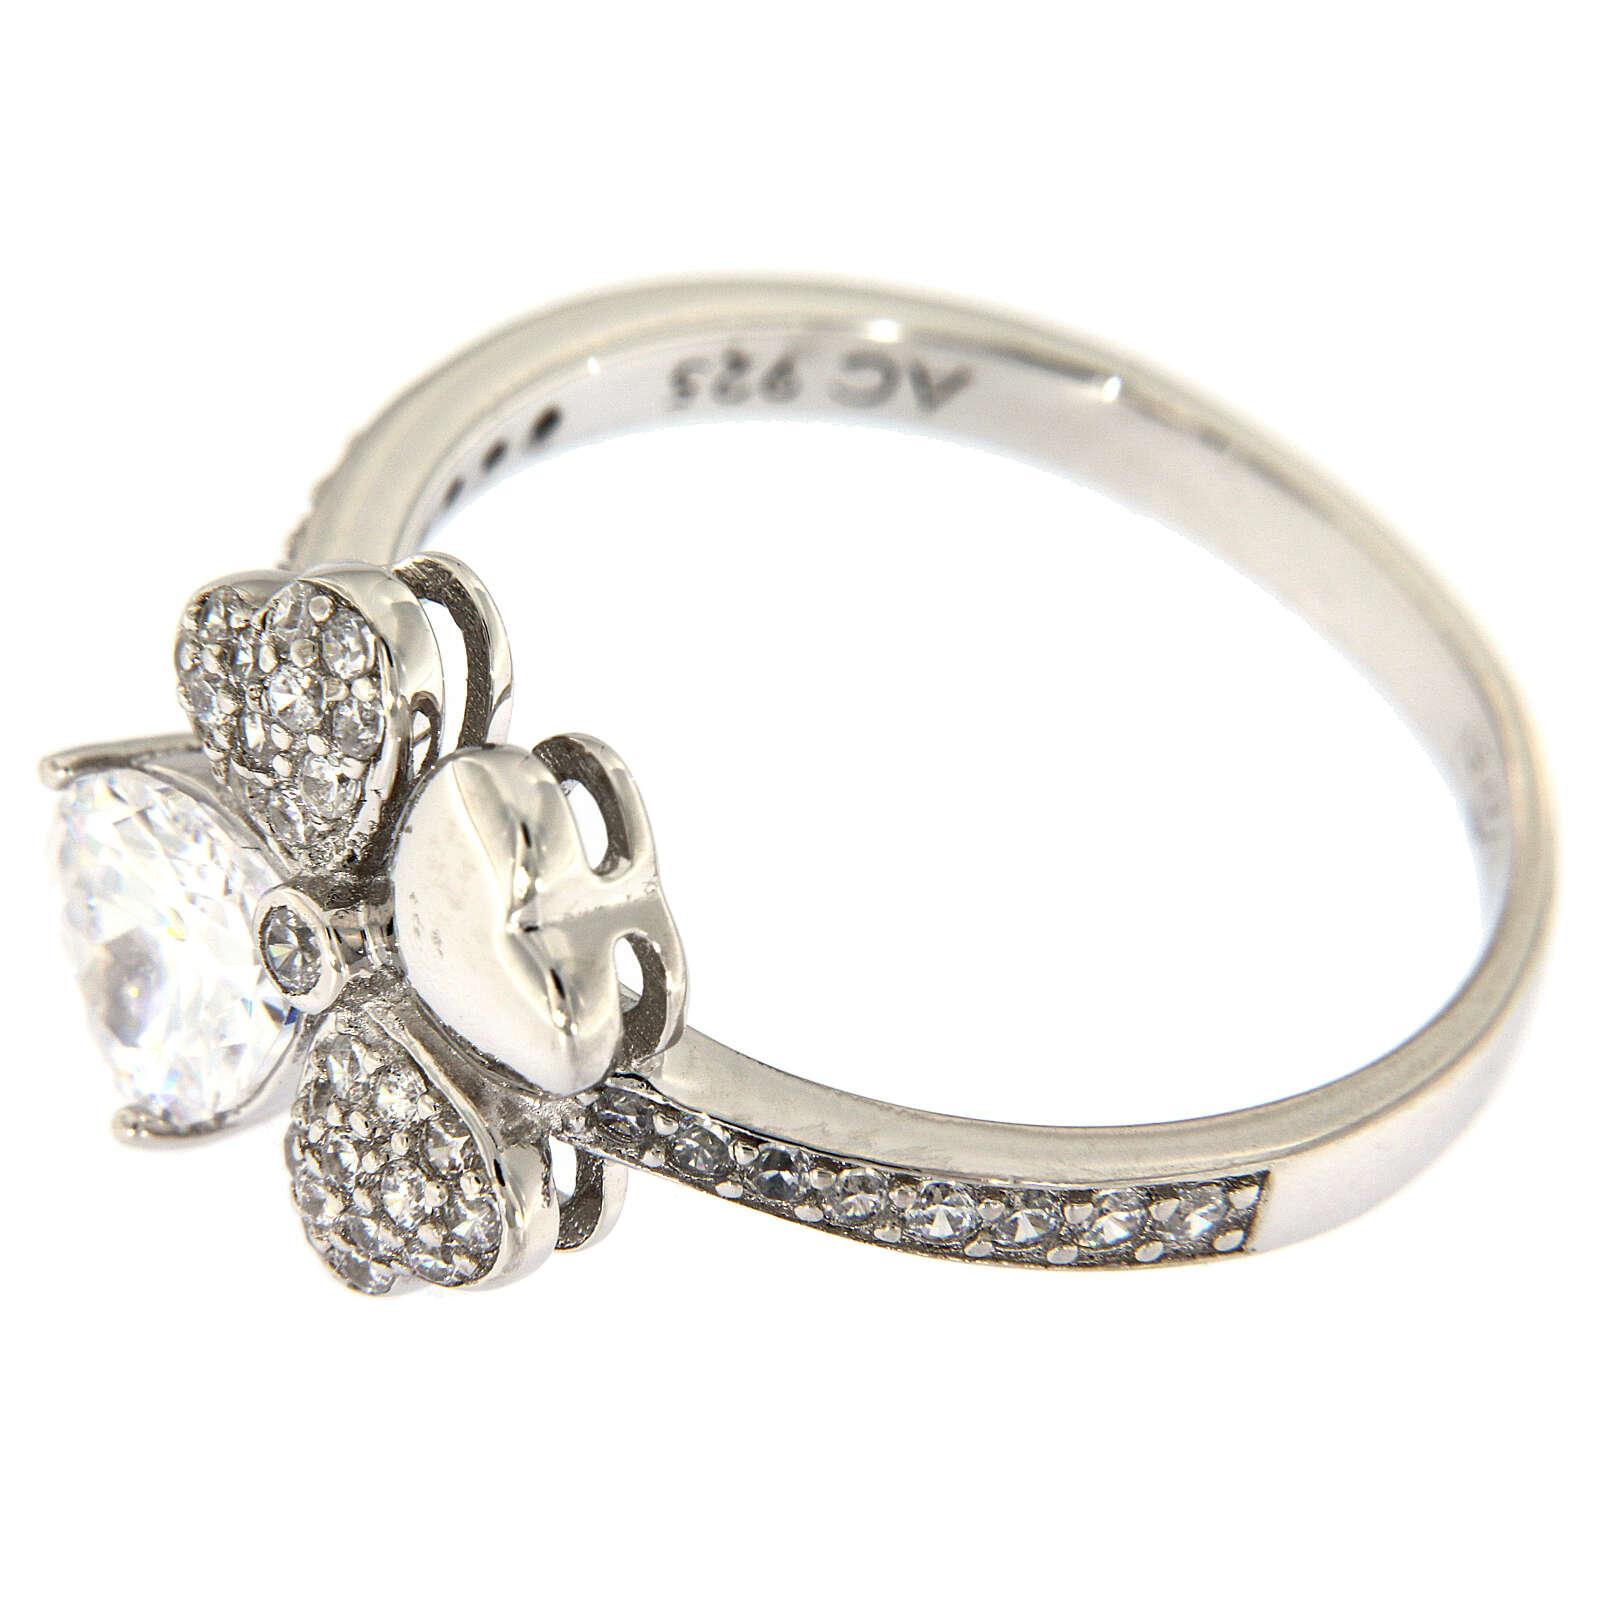 Ring AMEN Silber 925 Kleeblatt weissen Zirkonen 3